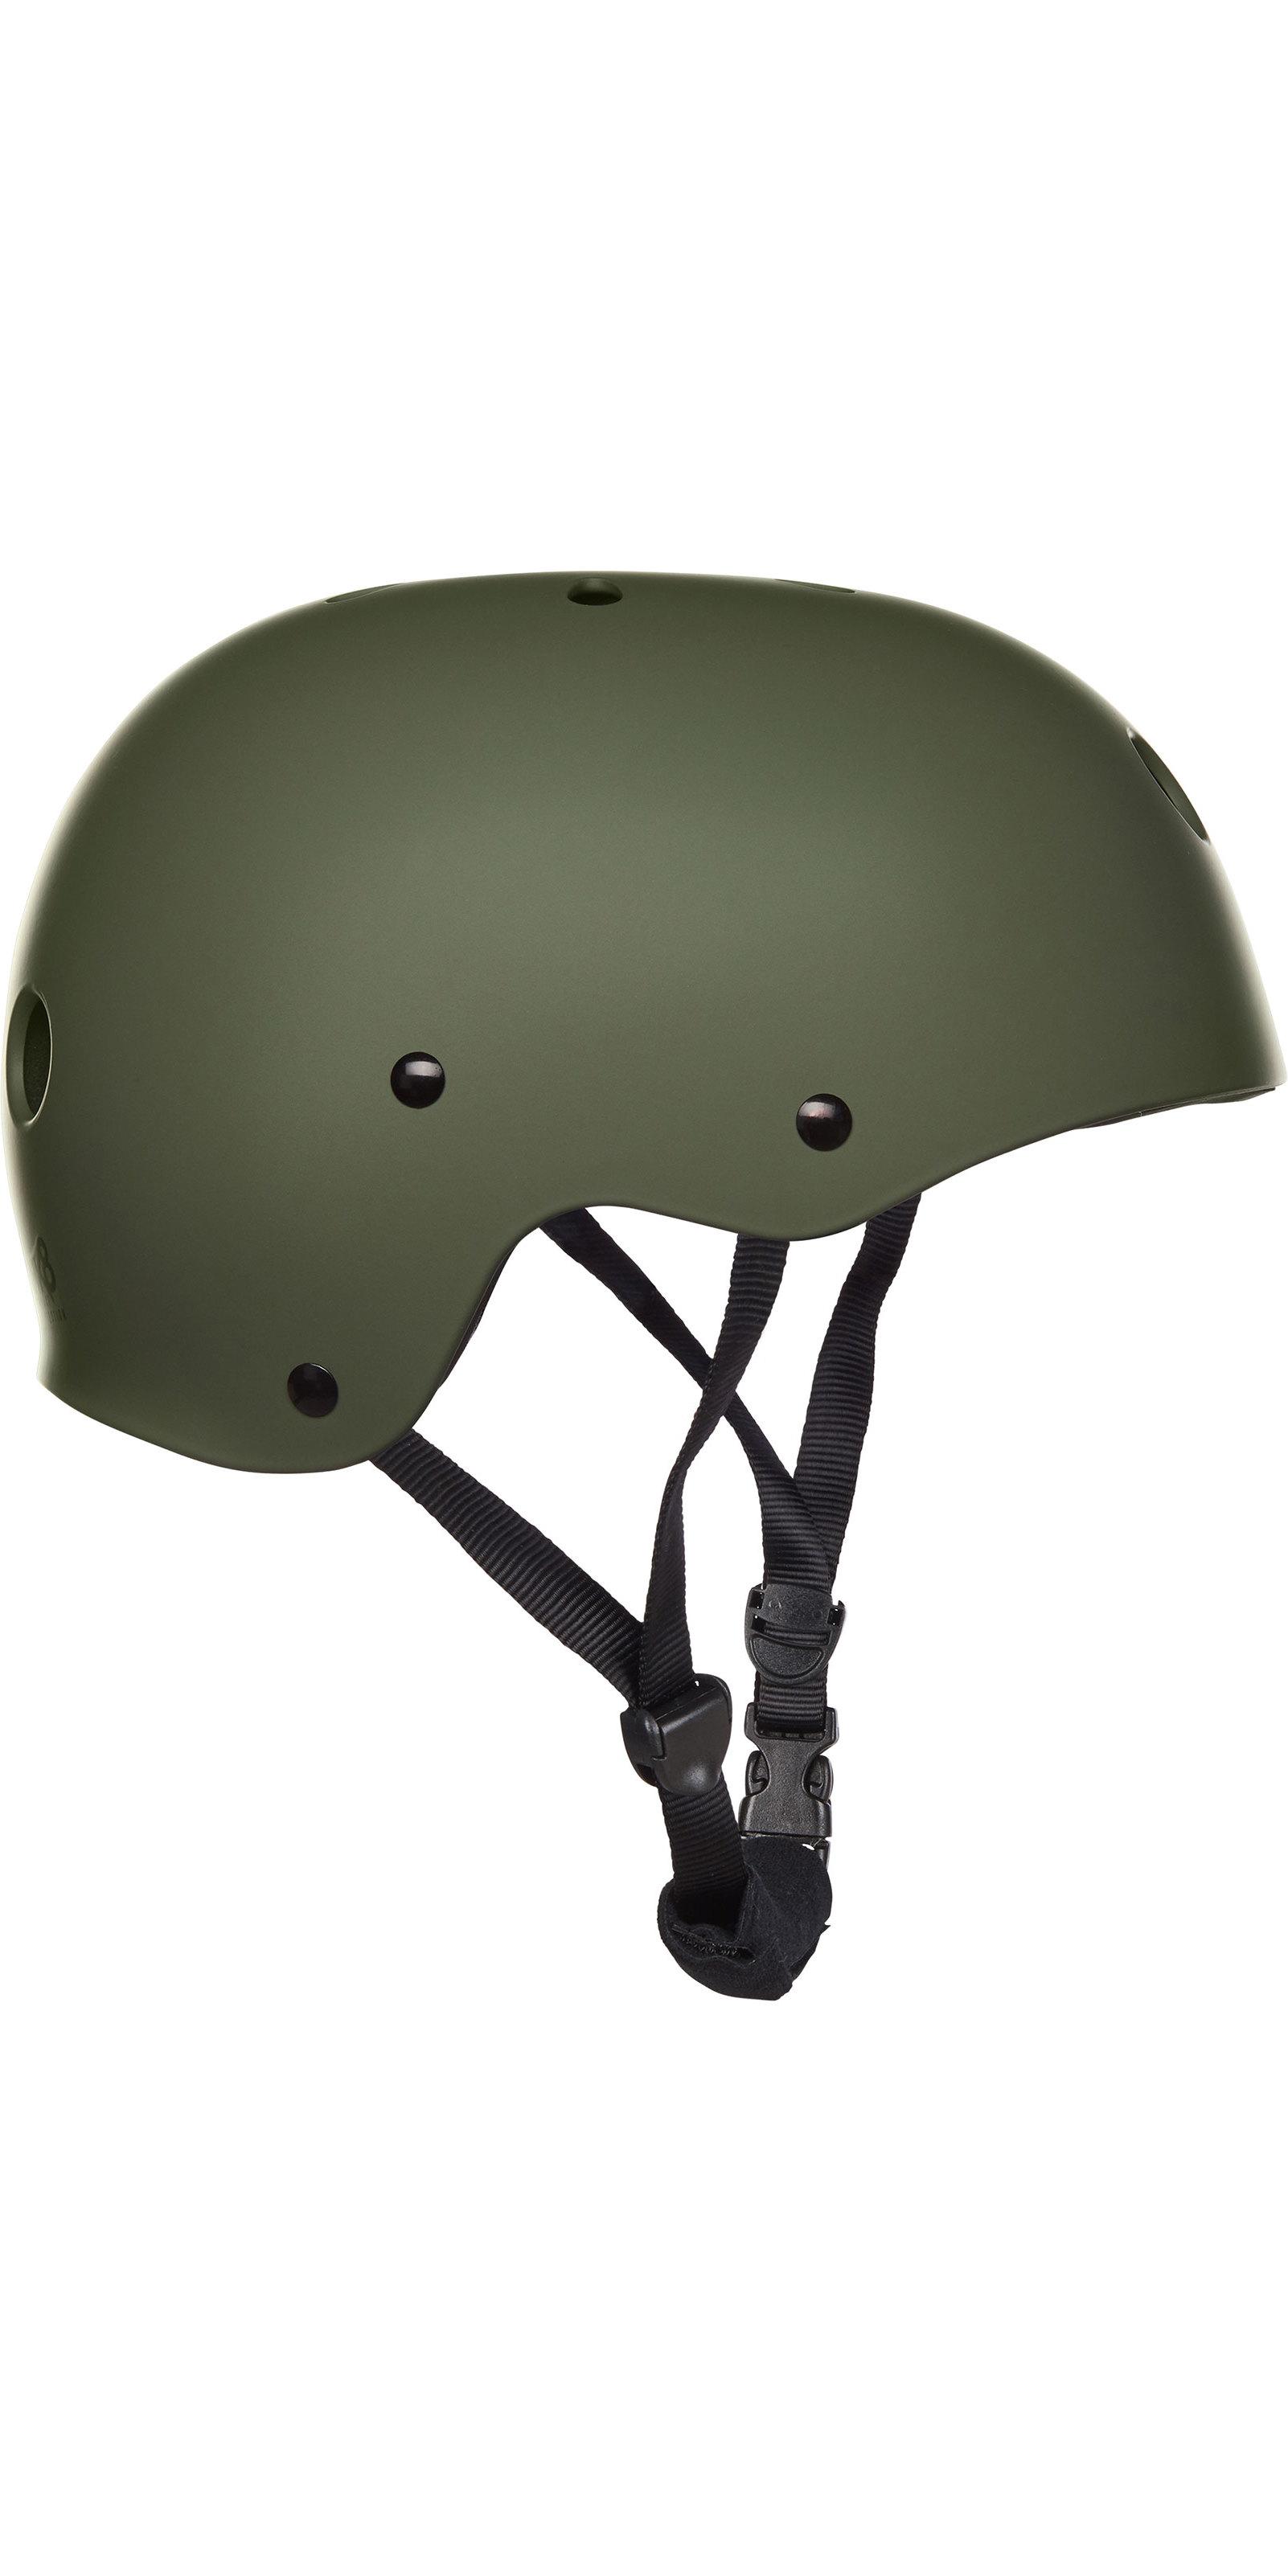 2019 Mystic MK8 Helmet Navy 180161 Ruder- & Paddelboote Bootsport